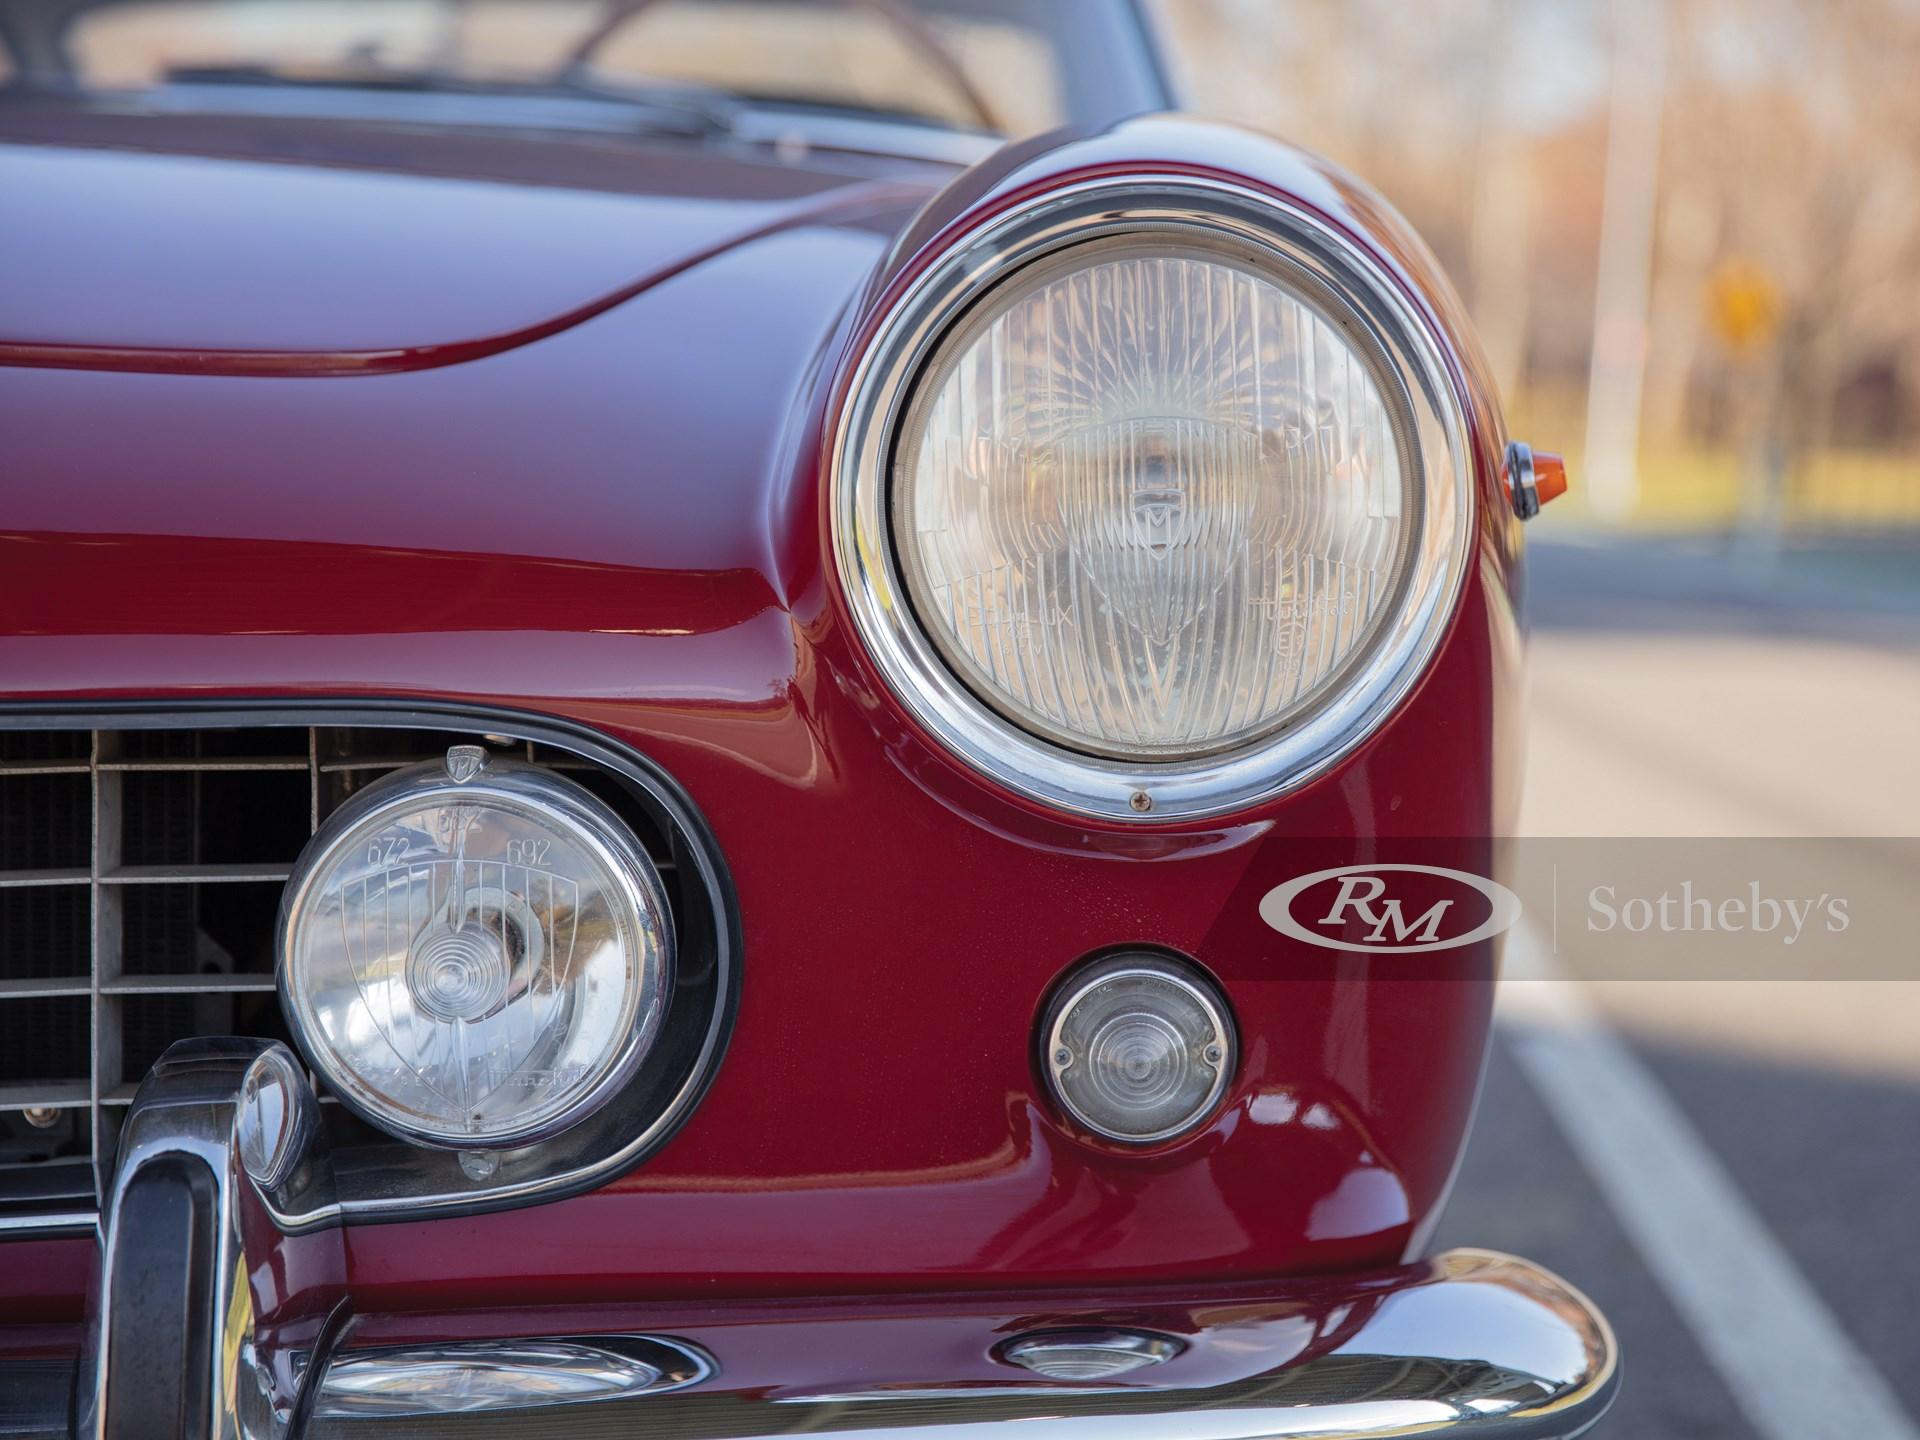 1962 Ferrari 250 GTE 2+2 Series II by Pininfarina -